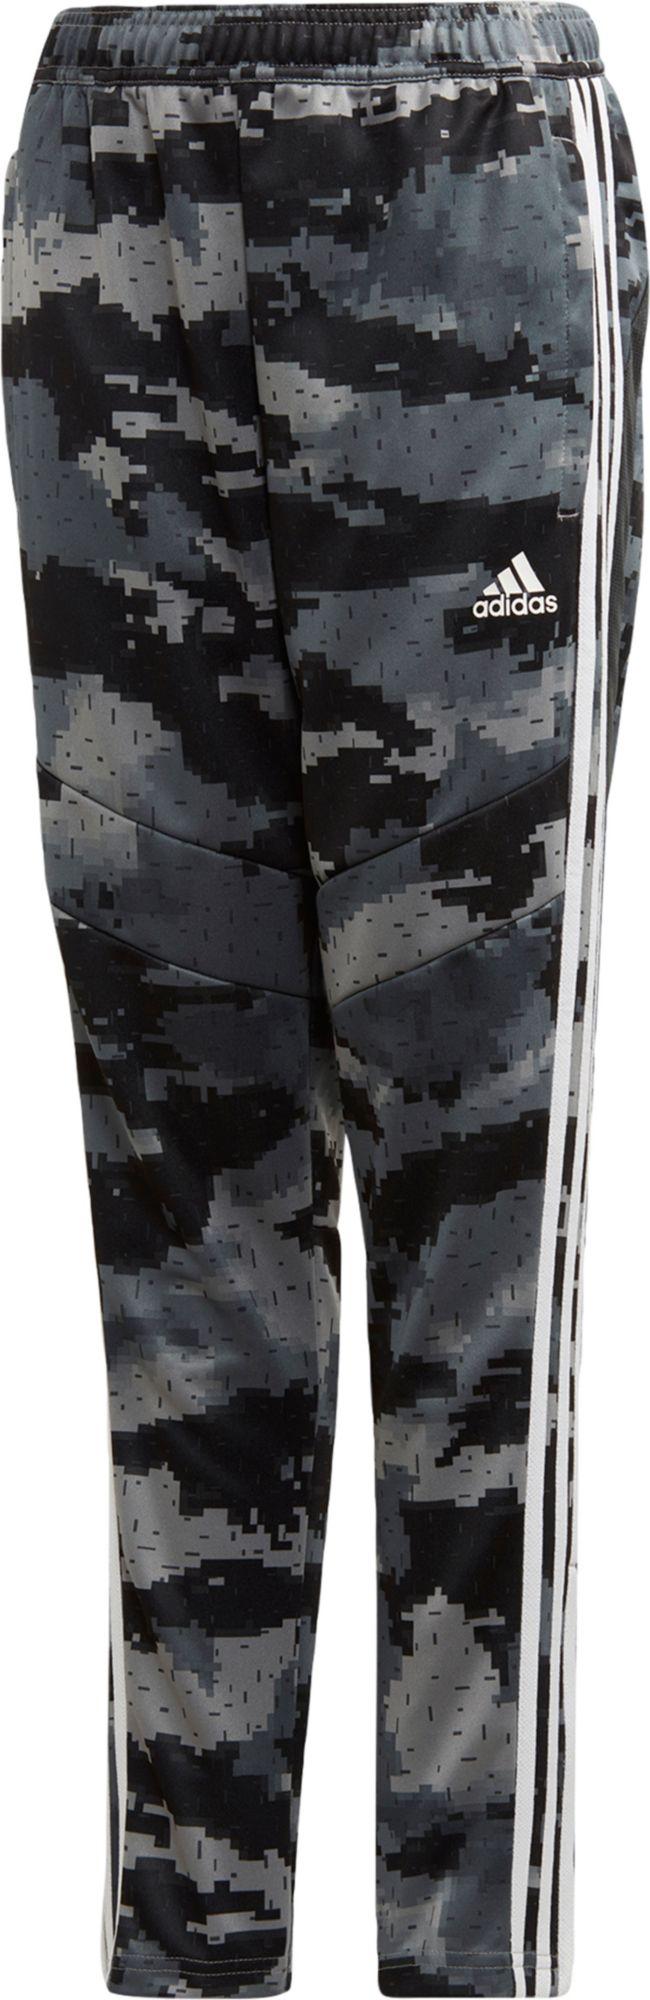 adidas Boy's Tiro 19 Camo Training Pants, Size: XS, Gray thumbnail